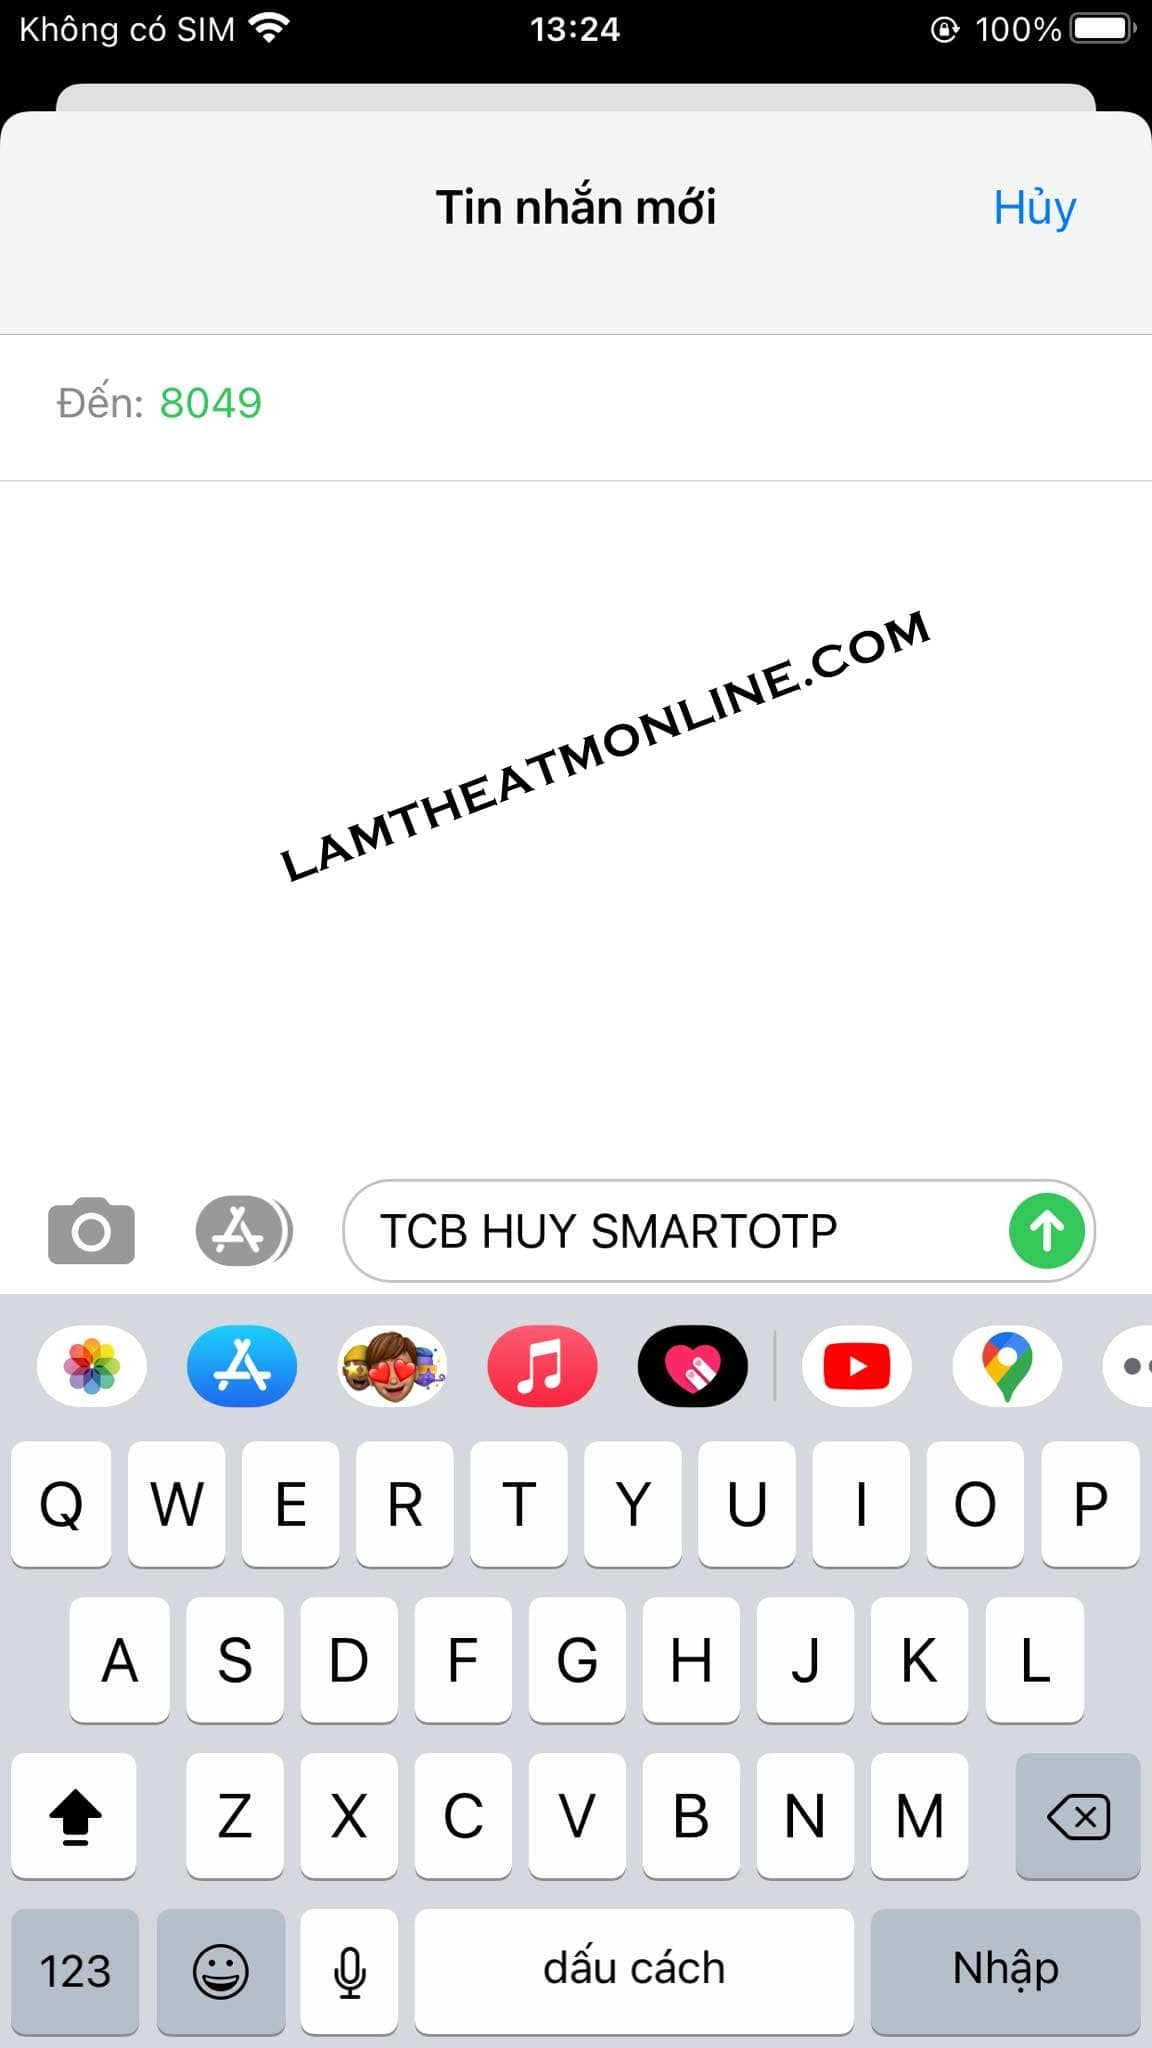 Cach huy smart otp techcombank